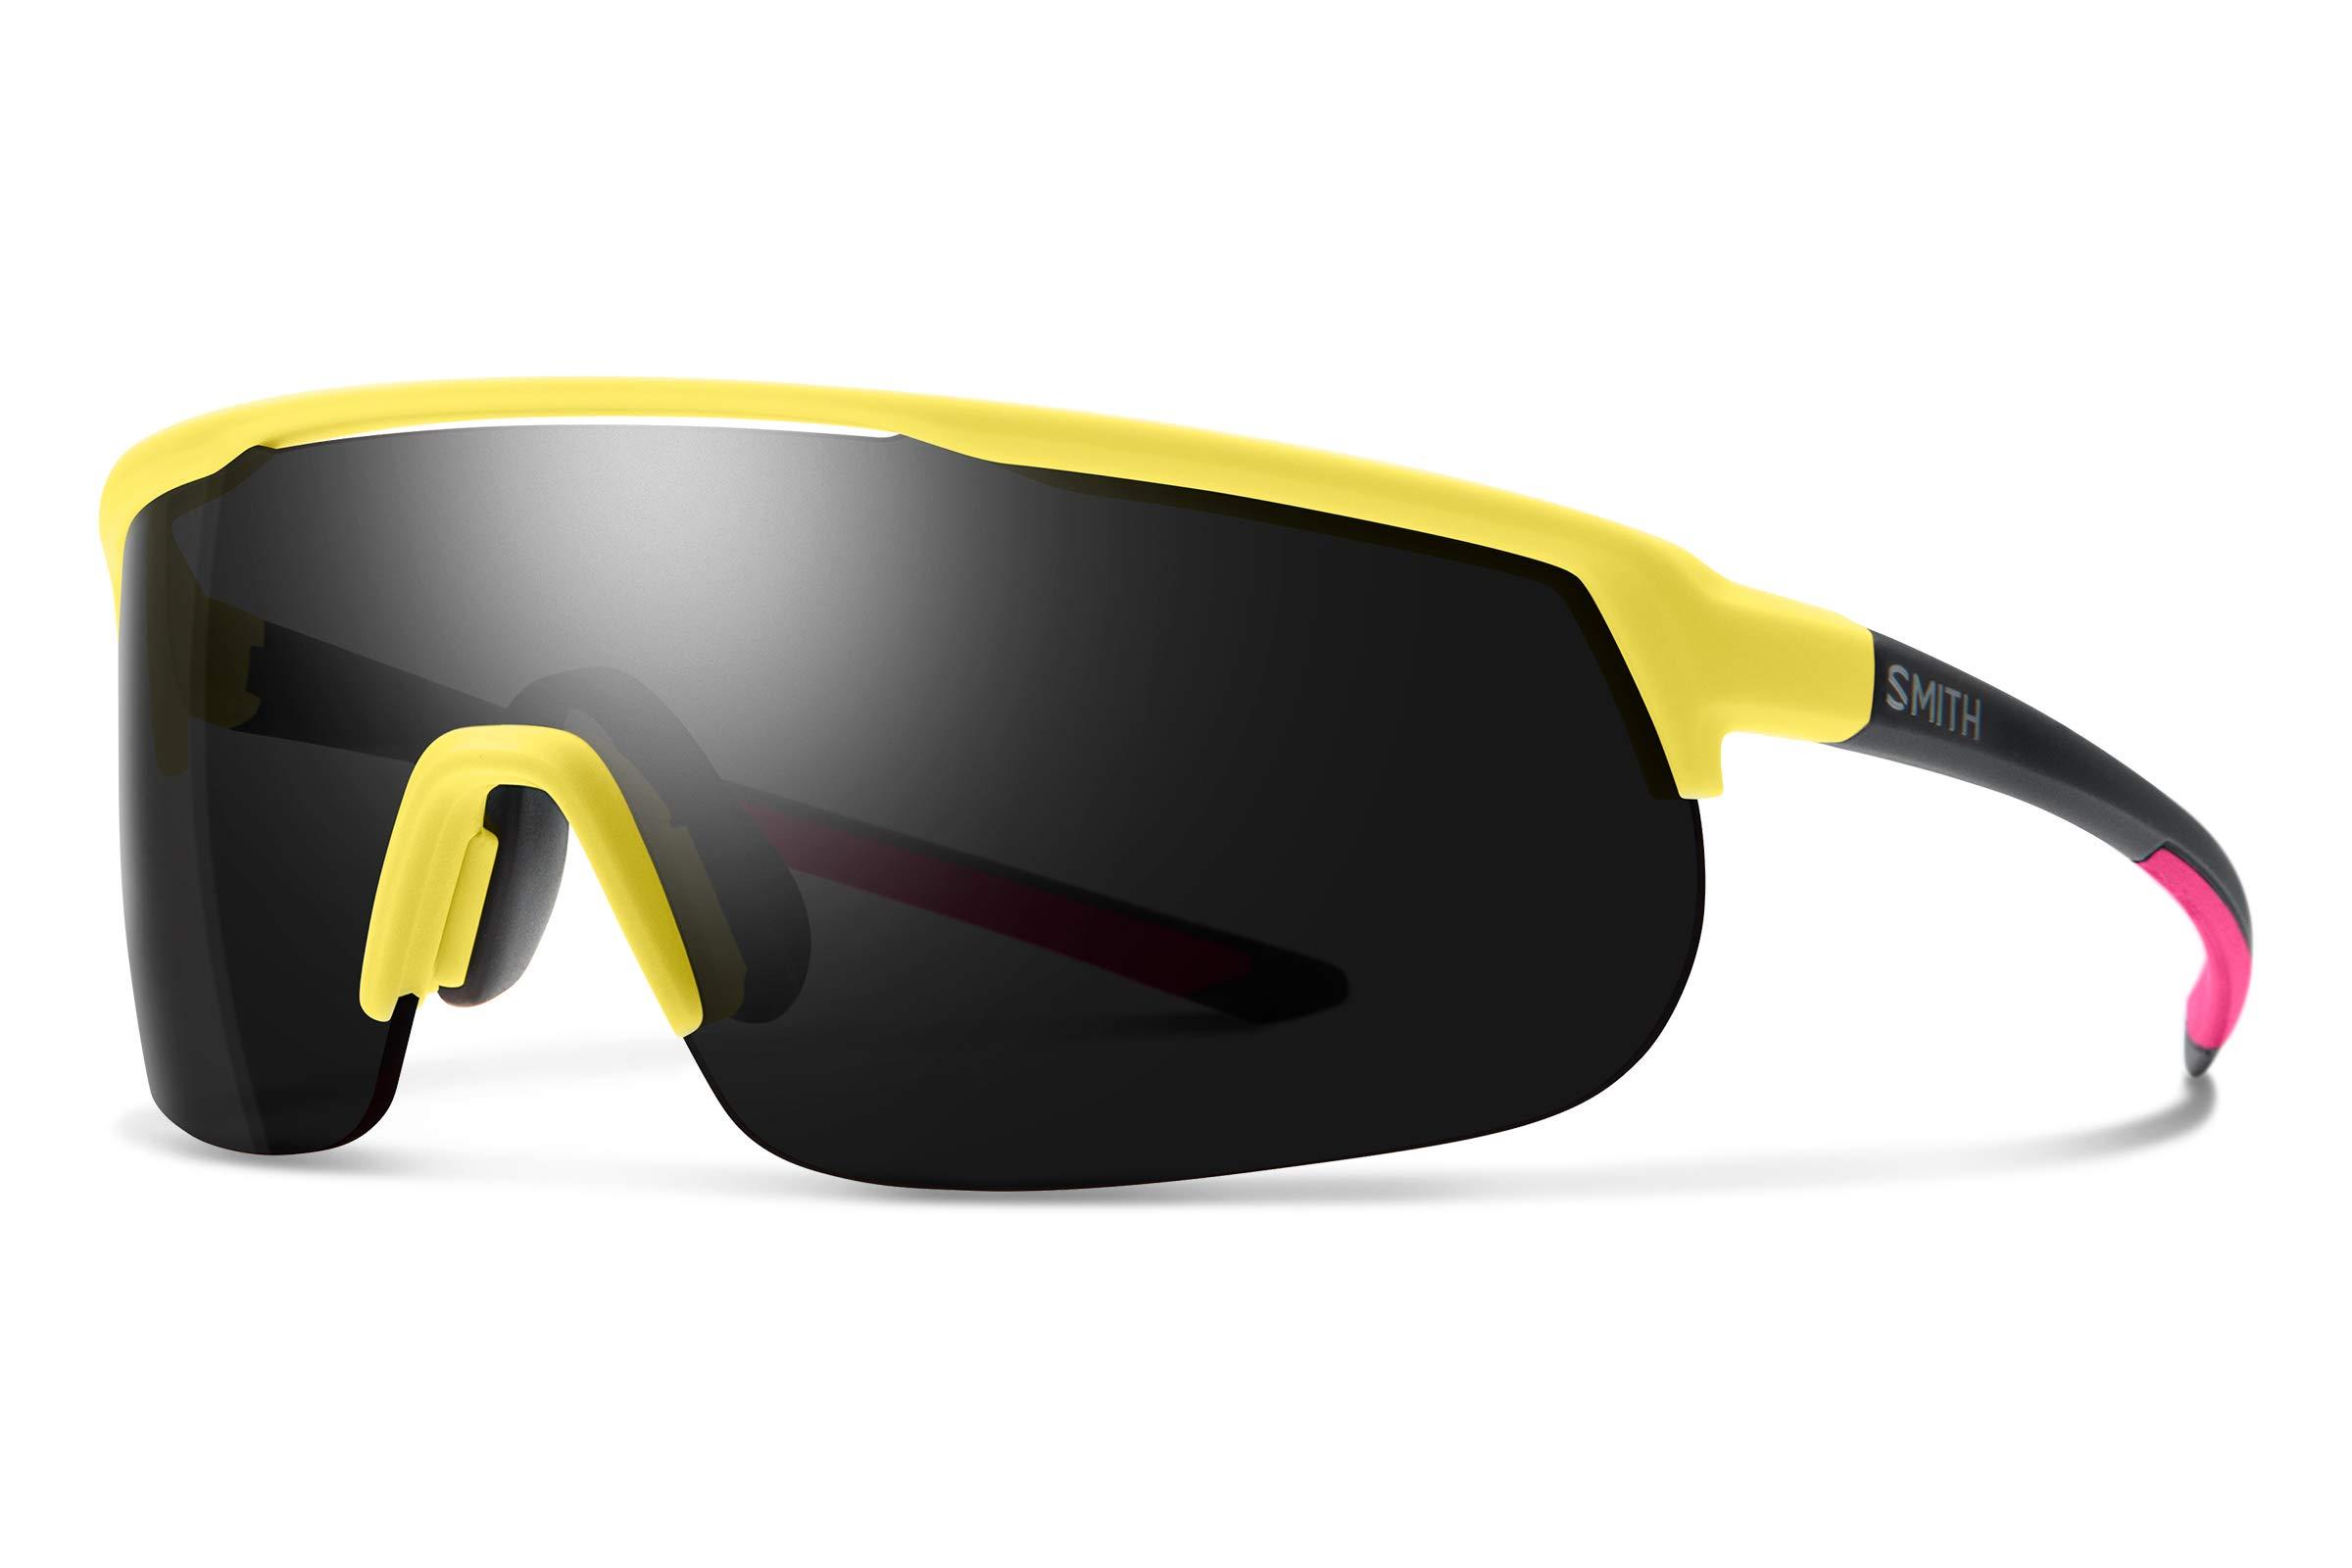 Smith Track Stand Chromapop Sunglasses, Matte Citron, Chromapop Sun Black/Contrast Rose